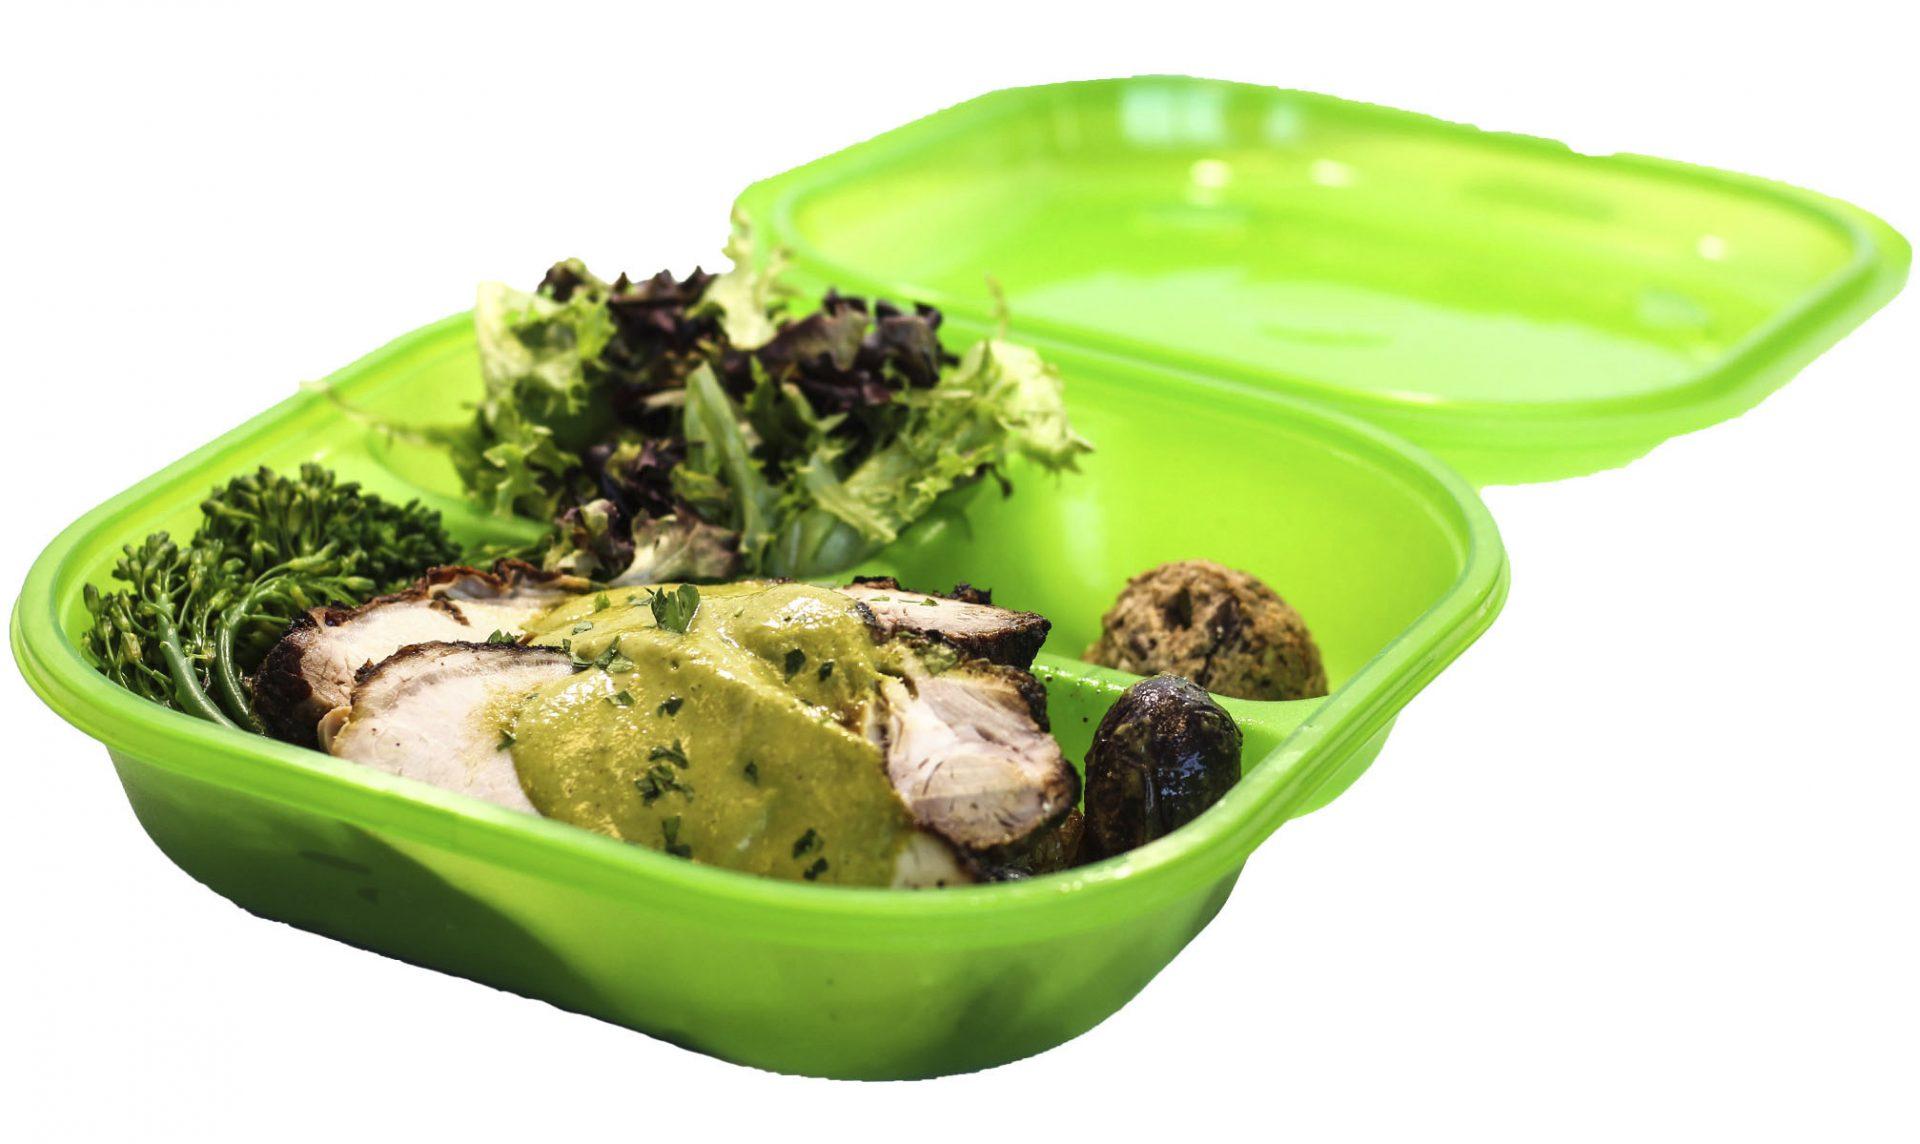 Mojo Pork Loin With Roasted Potatoes And Chili Glazed Broccolini